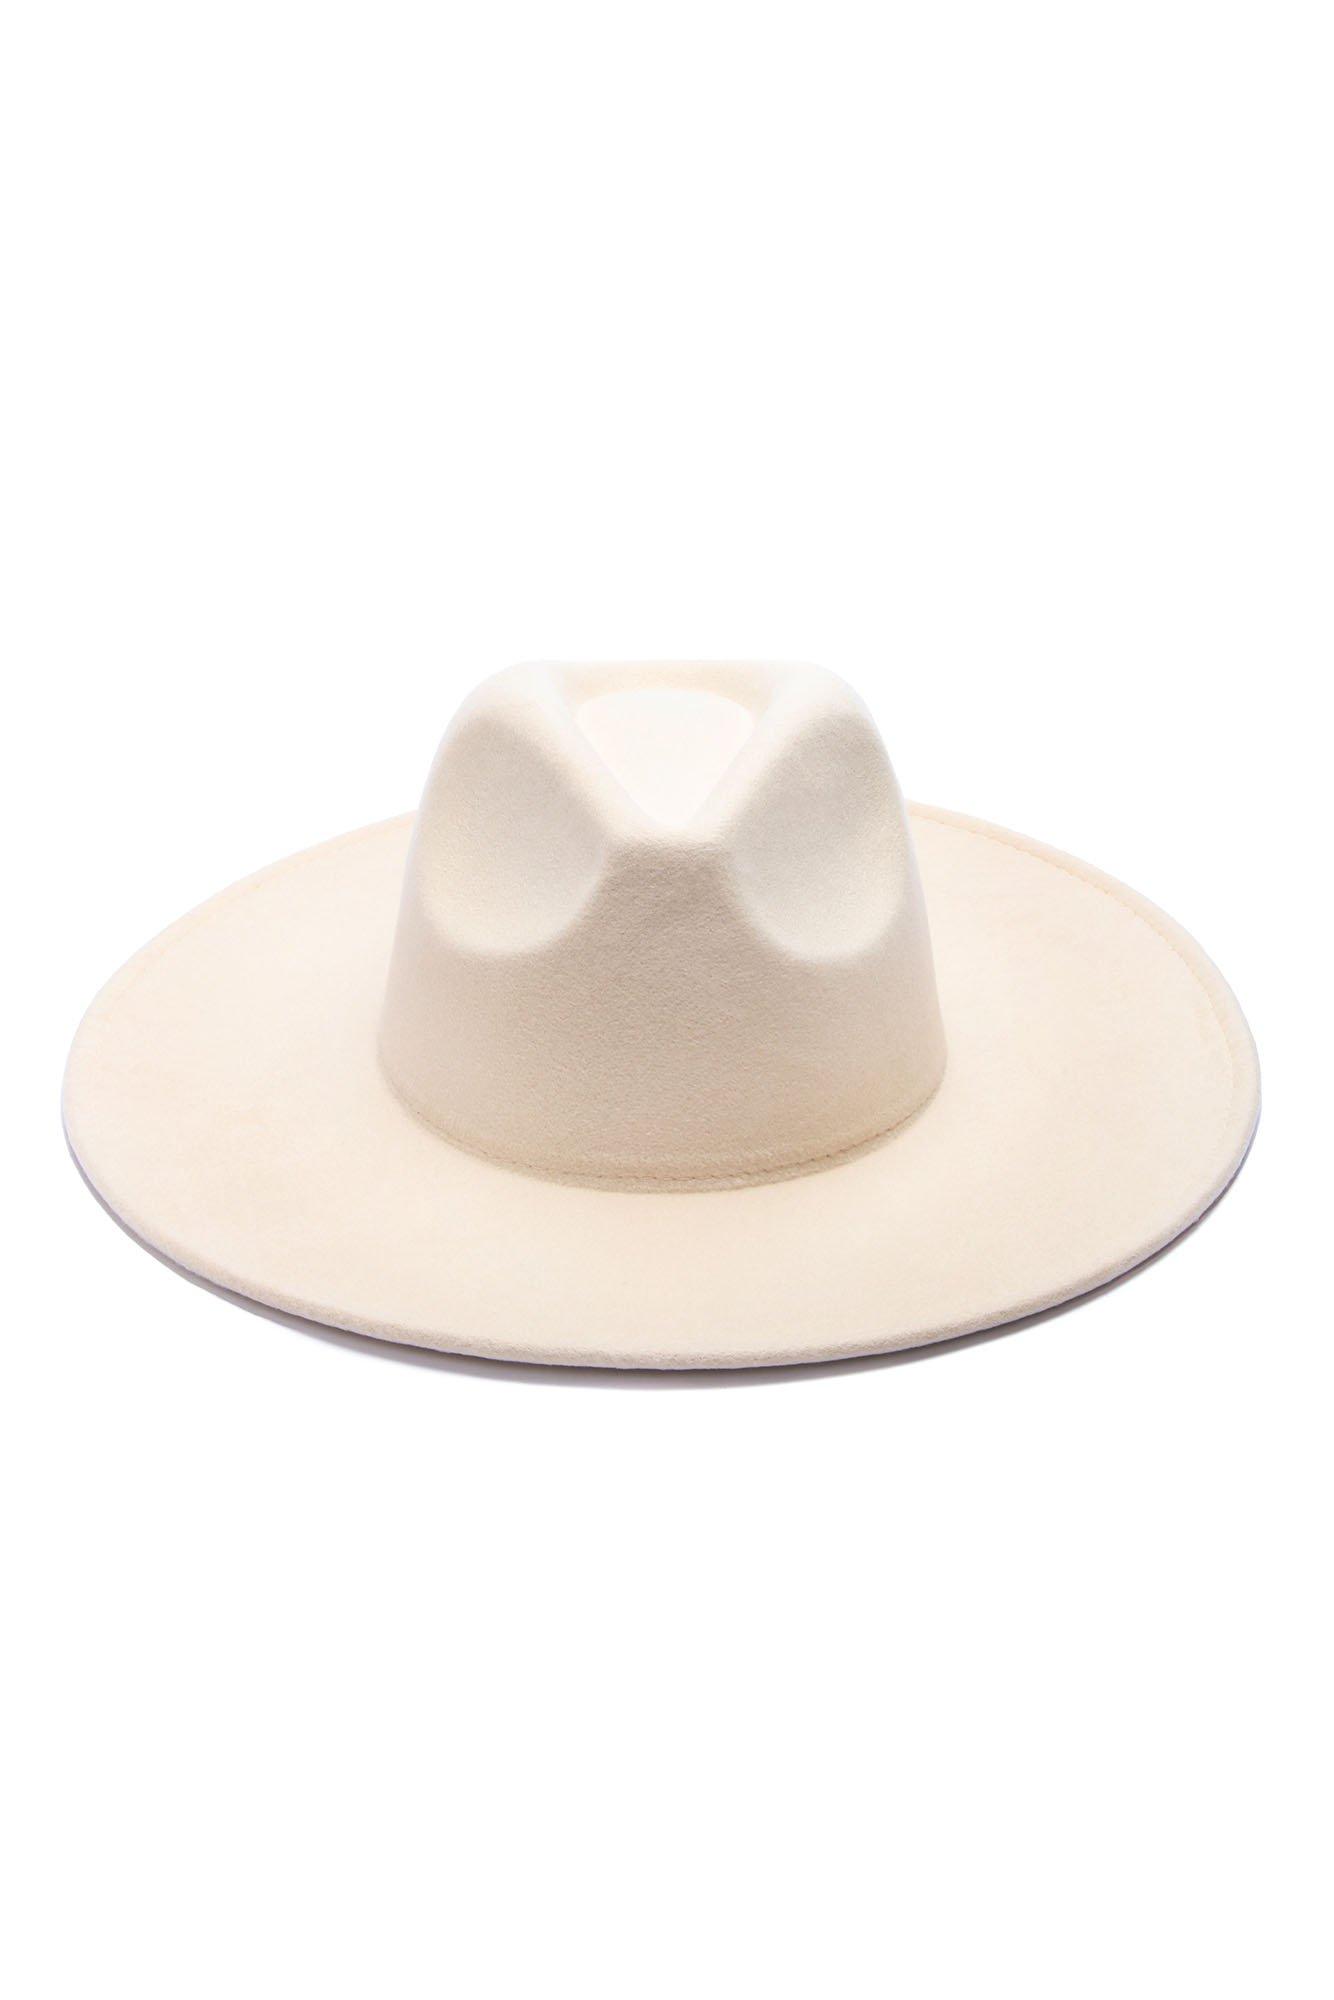 fashion-nova-hat